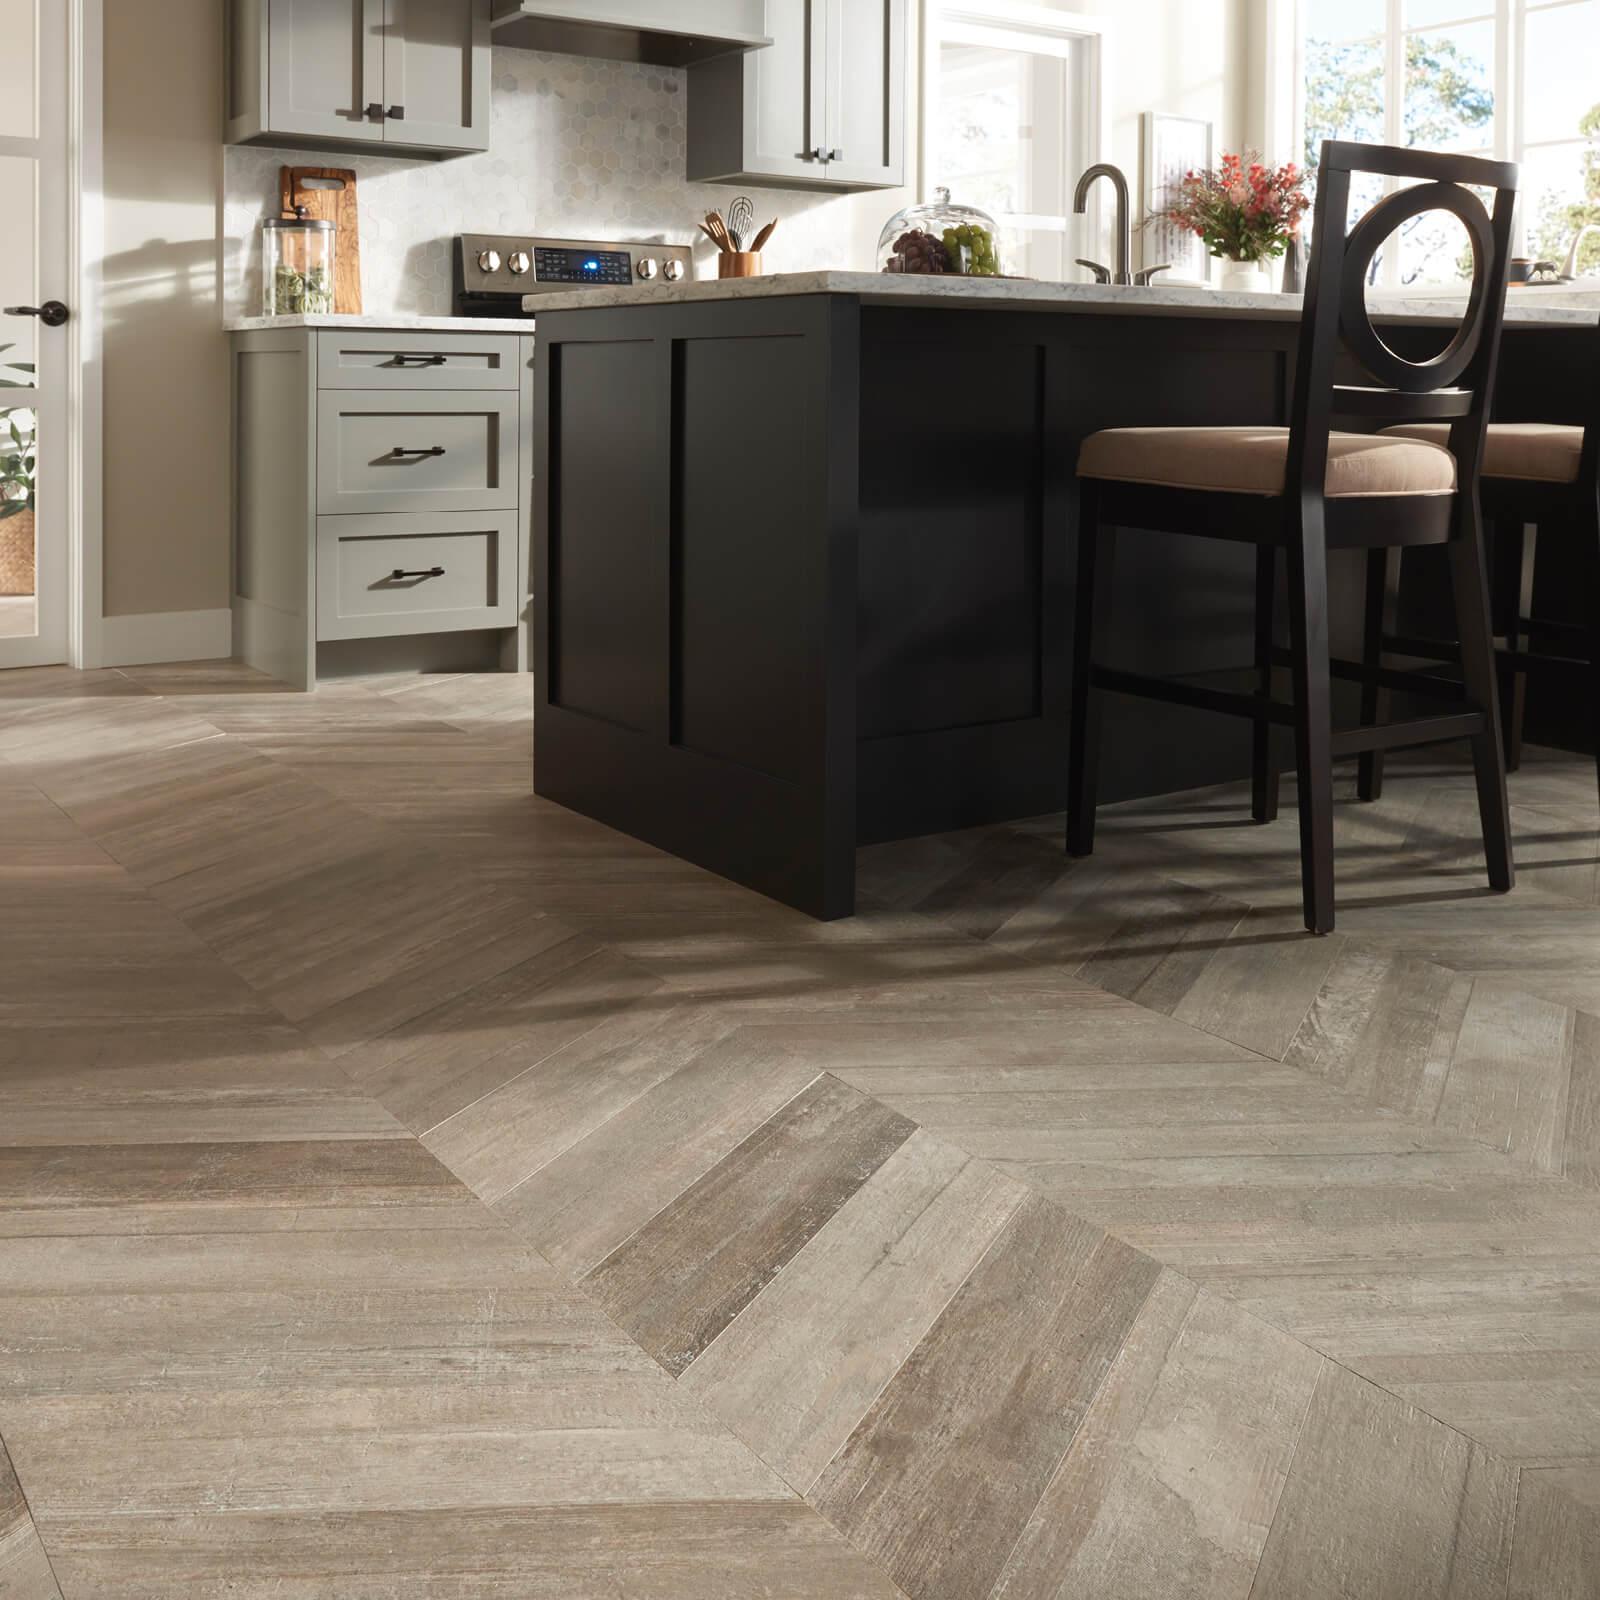 Glee chevron flooring | Floorida Floors